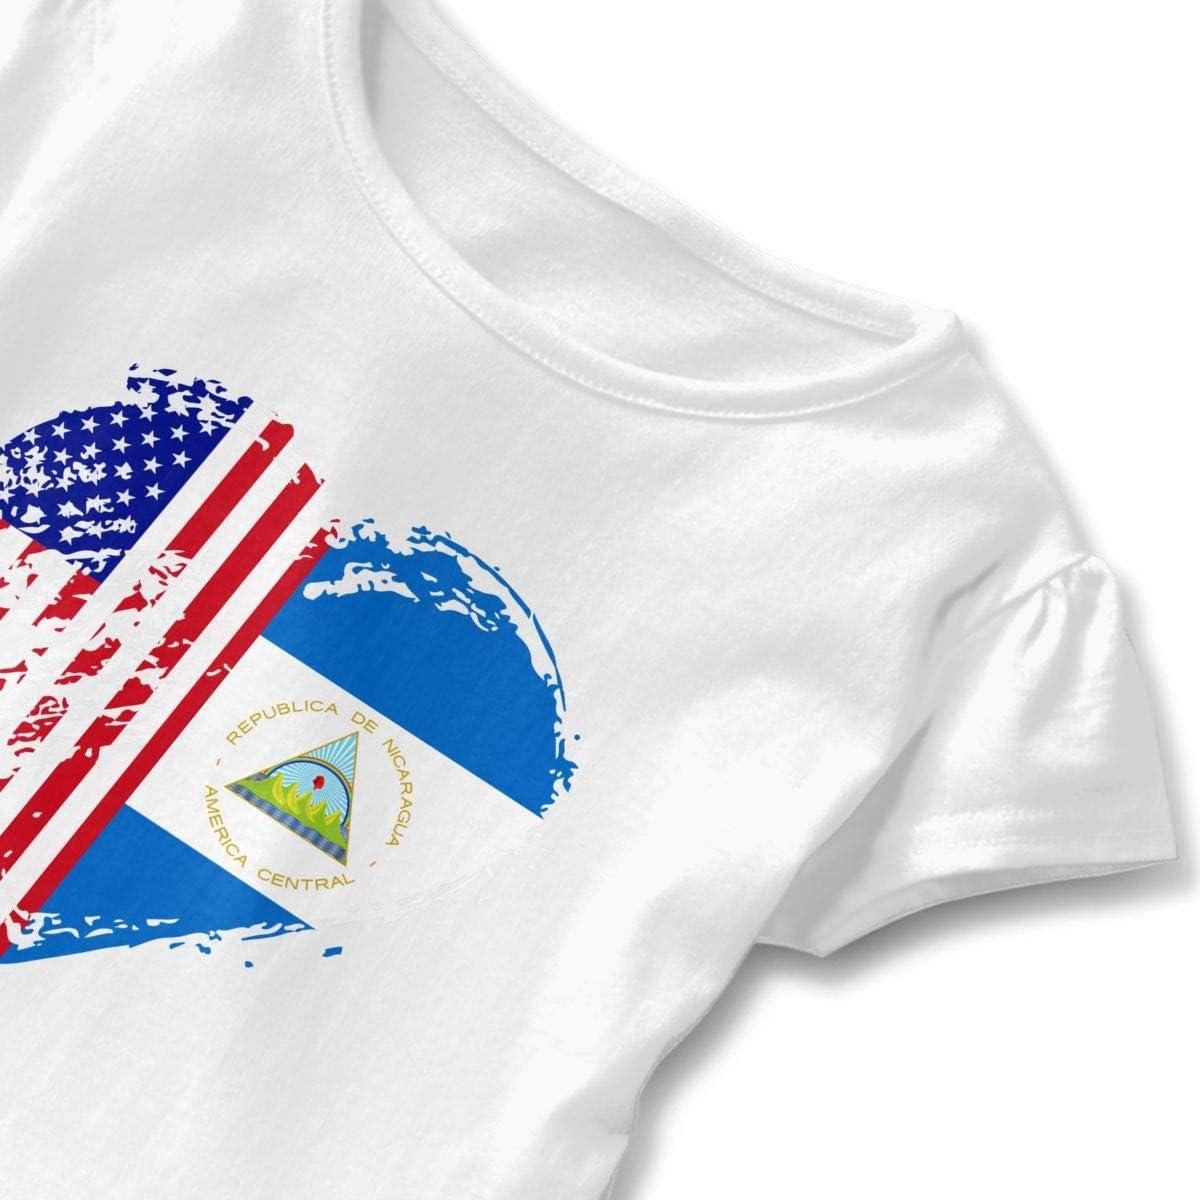 26NSHIRT Grungy Nicaragua American Flag Heart Girls Short Sleeve Cotton Tops